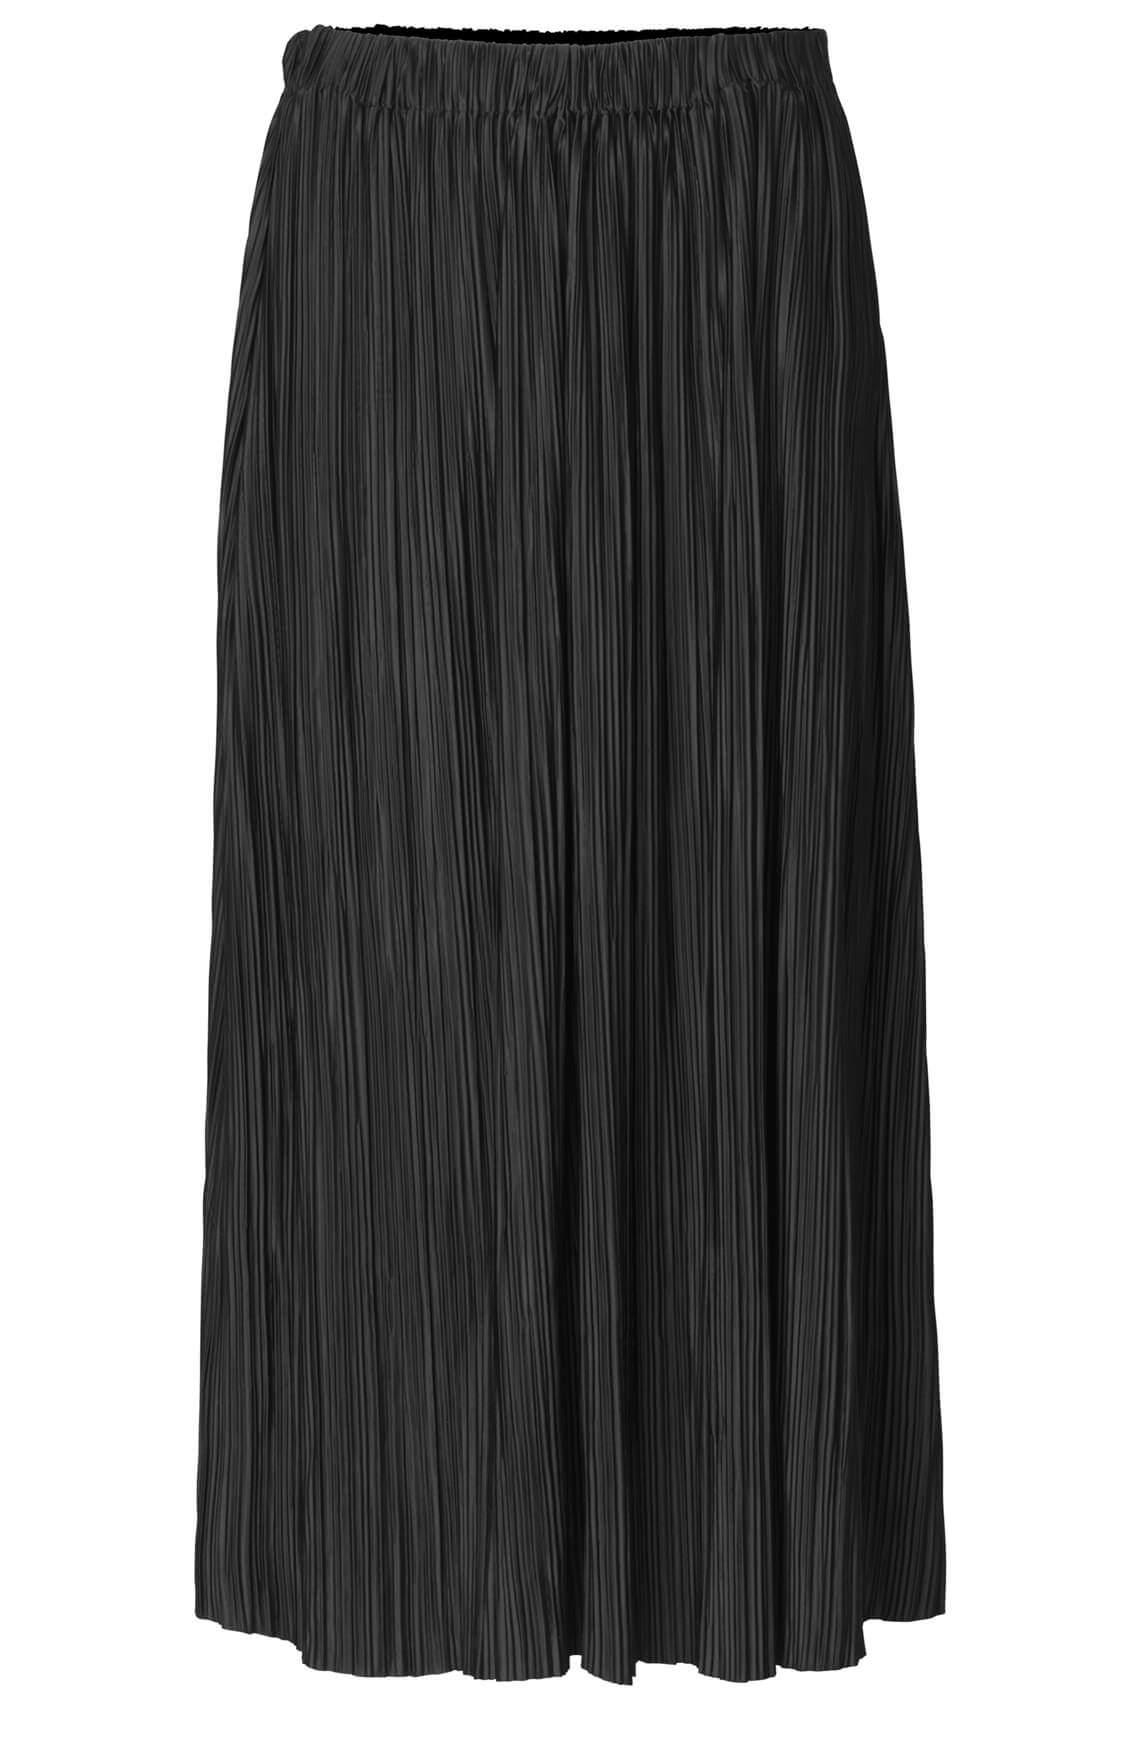 Samsoe Samsoe Dames Uma lange plissé rok zwart